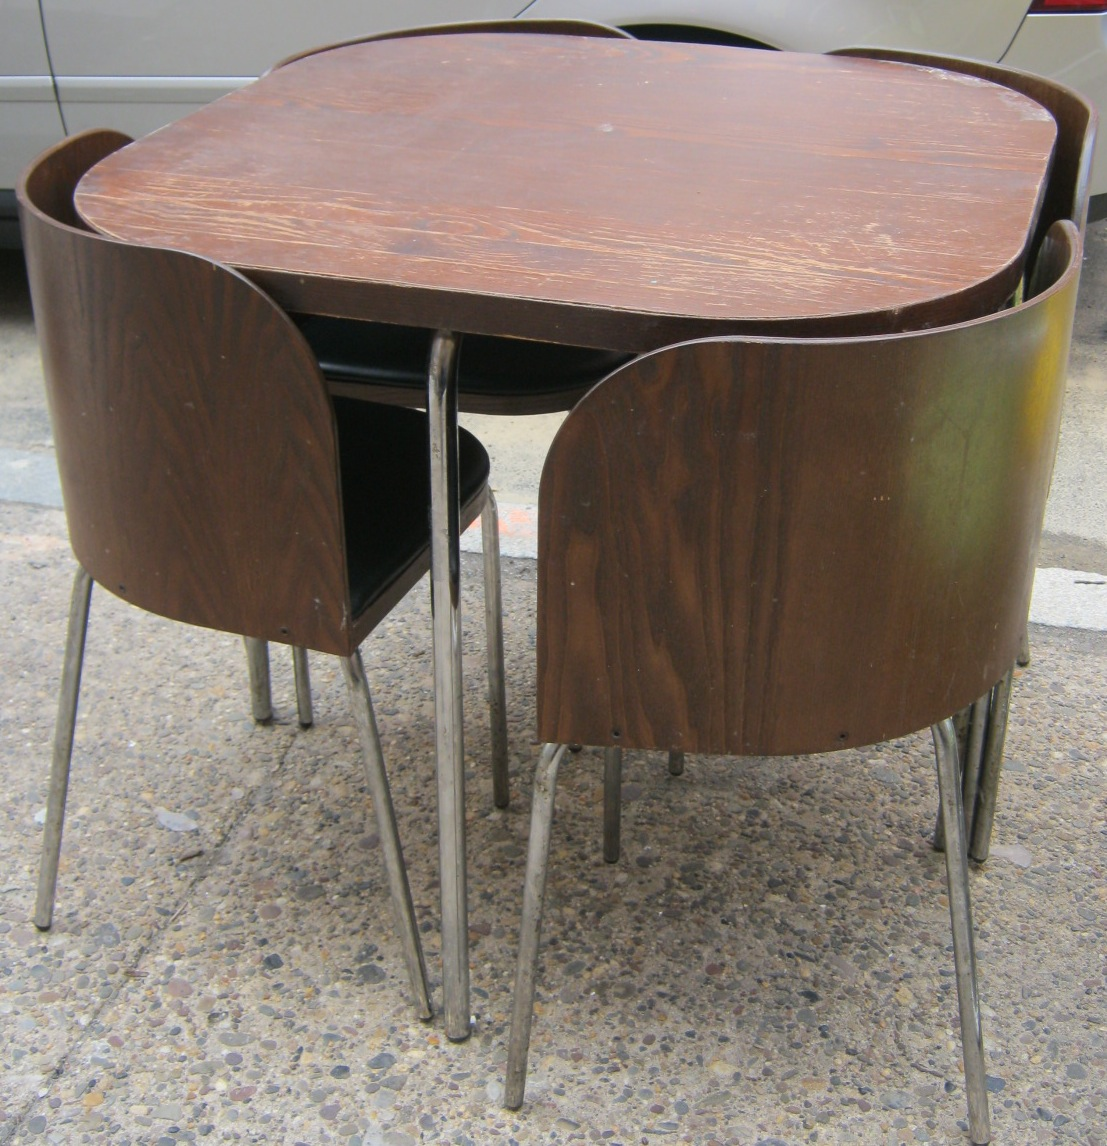 Uhuru Furniture & Collectibles: IKEA Fusion Kitchenette SOLD